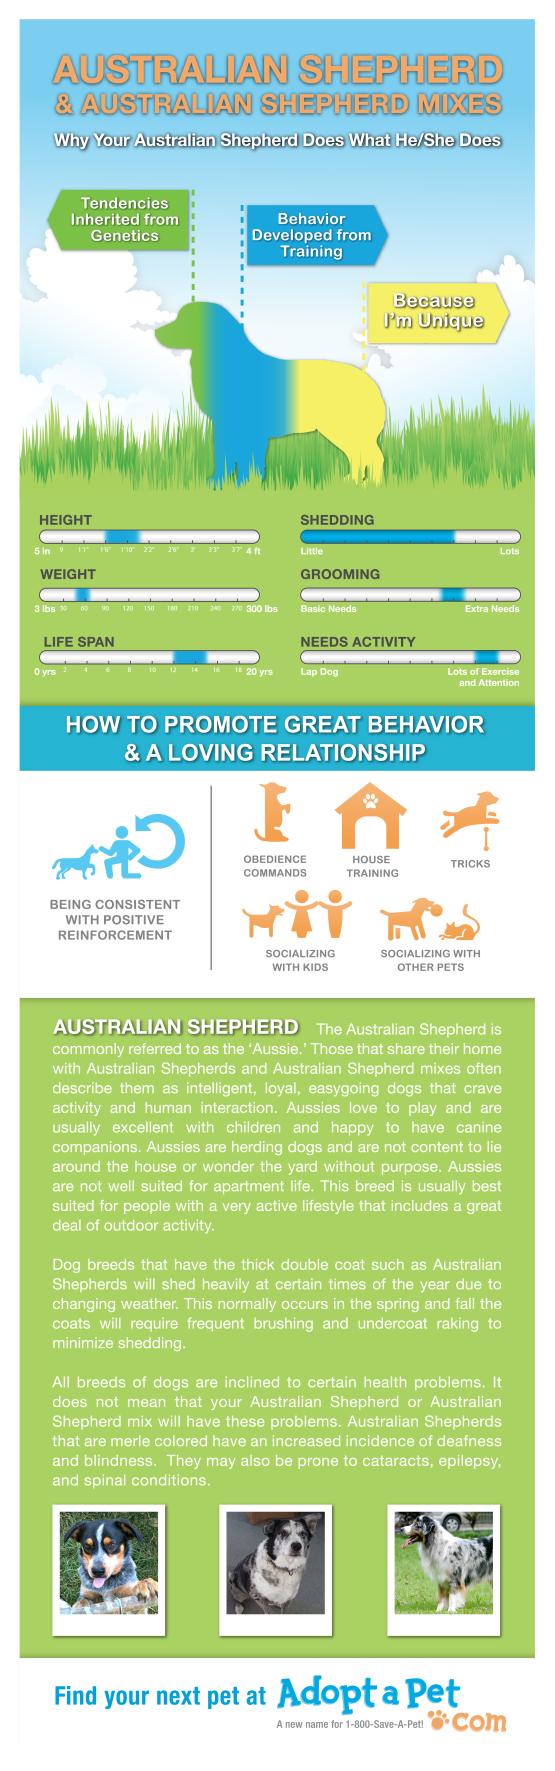 Adopt-A-Pet Australian Shepherd Dog or Puppy